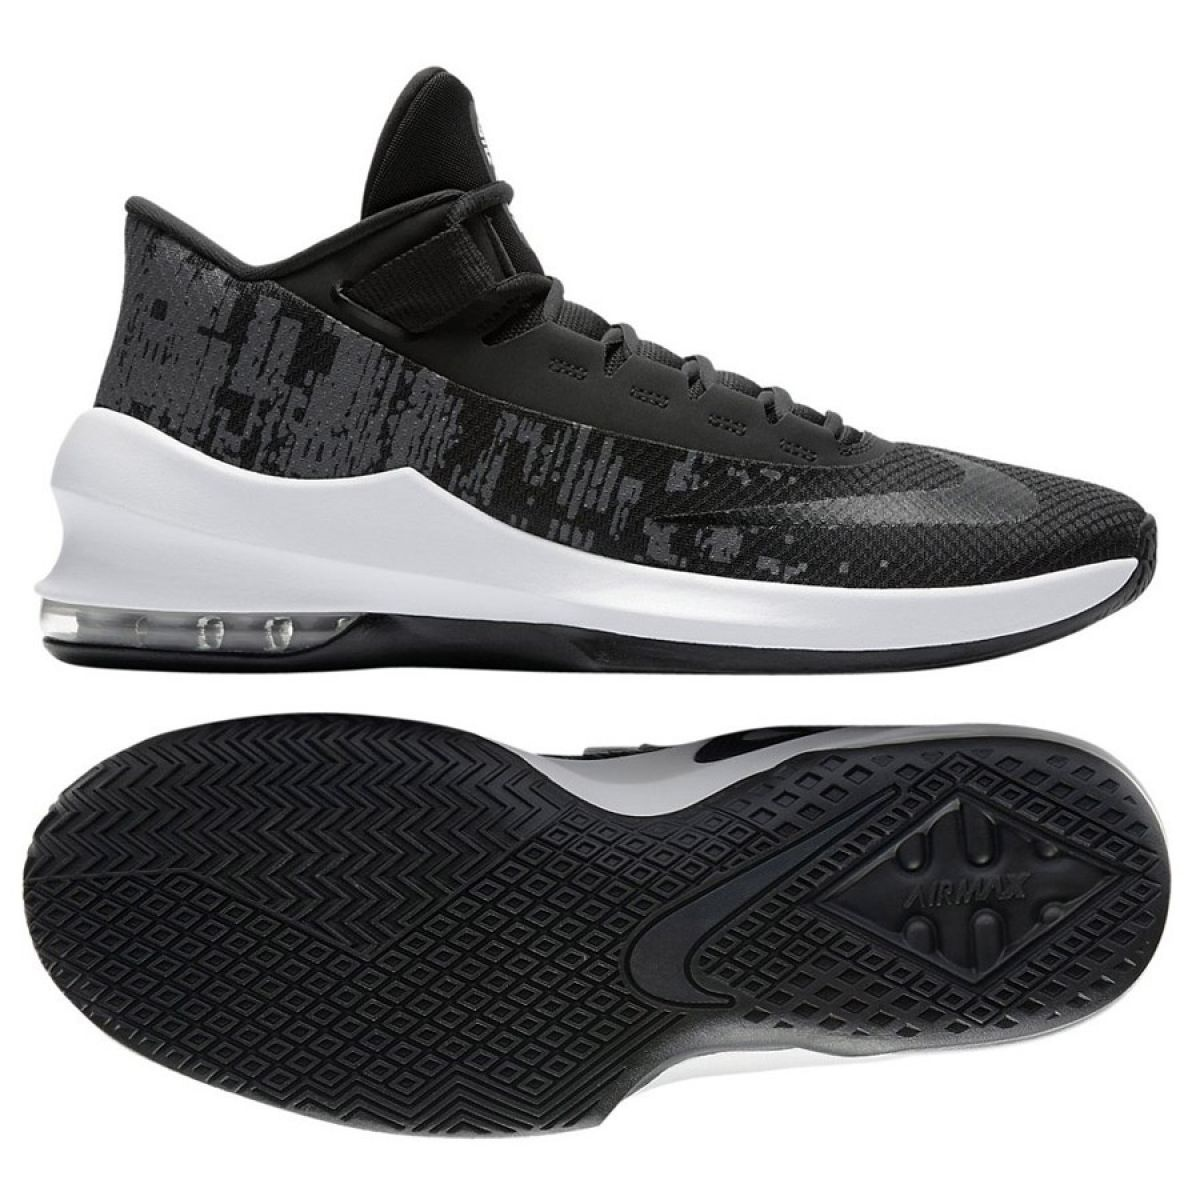 Zapatillas de baloncesto Nike Air Max Infuriate 2 Mid M AA7066 001 negro negro